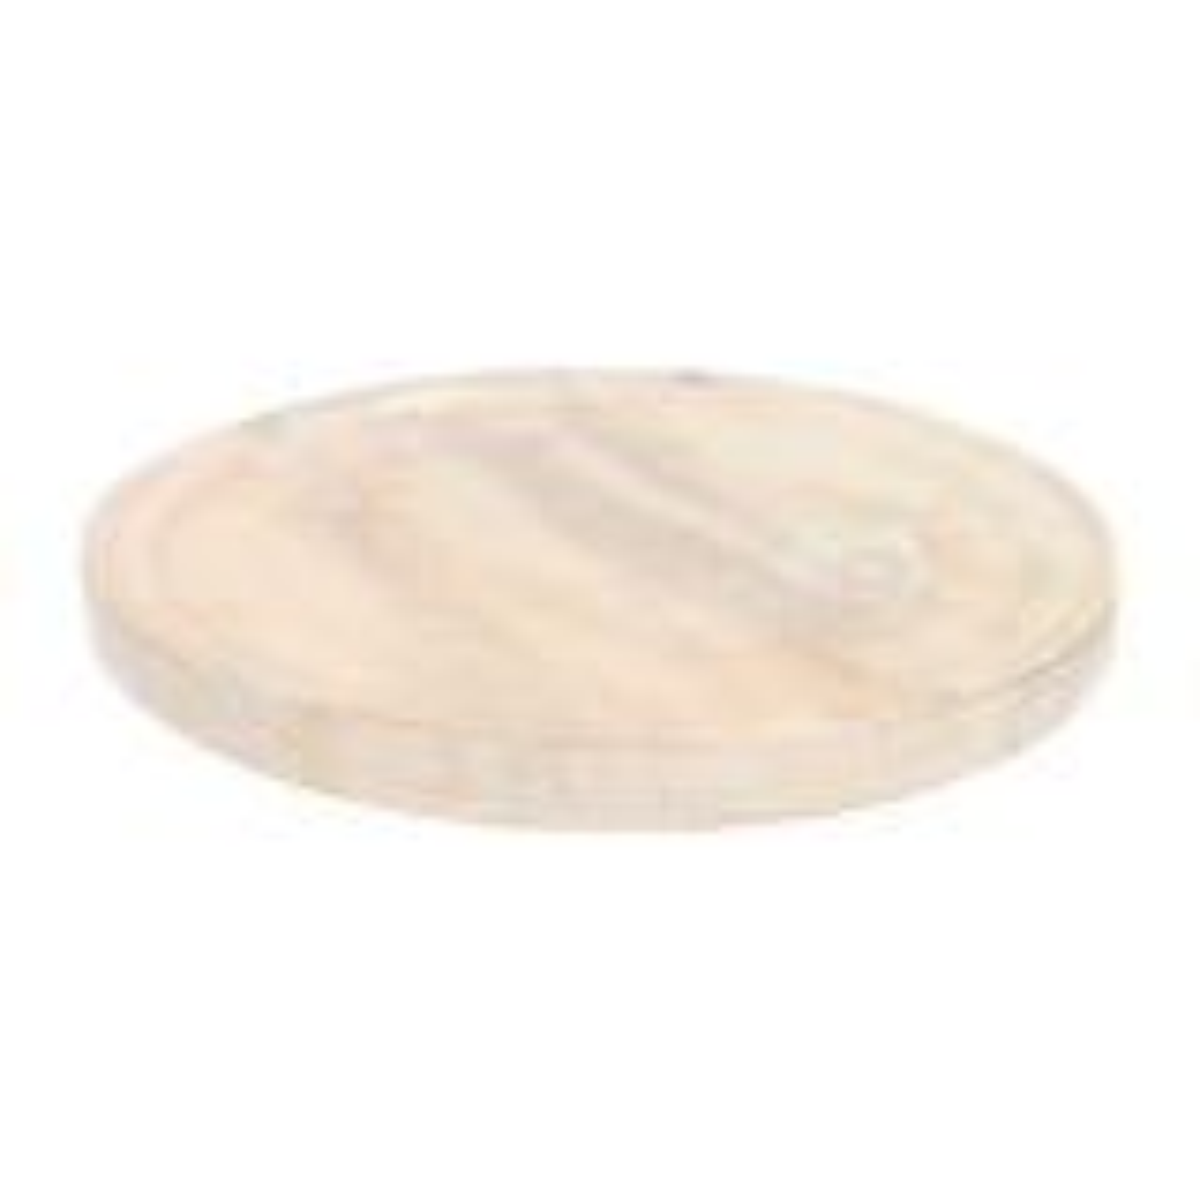 Houten onderbord 30 cm white wash